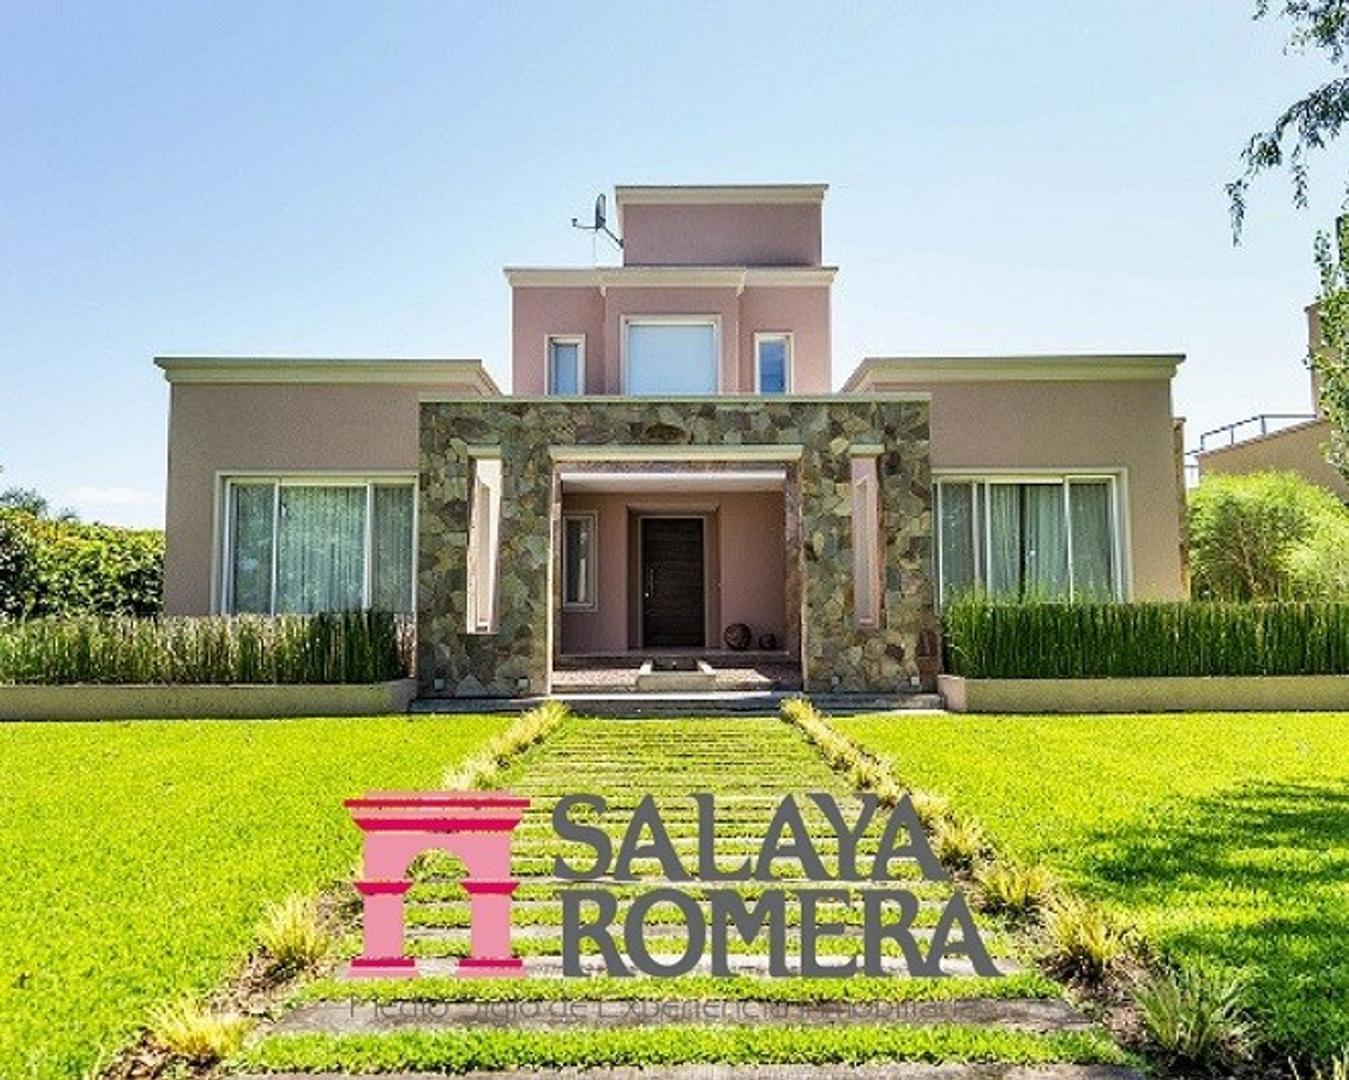 Casa - Venta - Argentina, Tigre - Isla Santa Monica 100